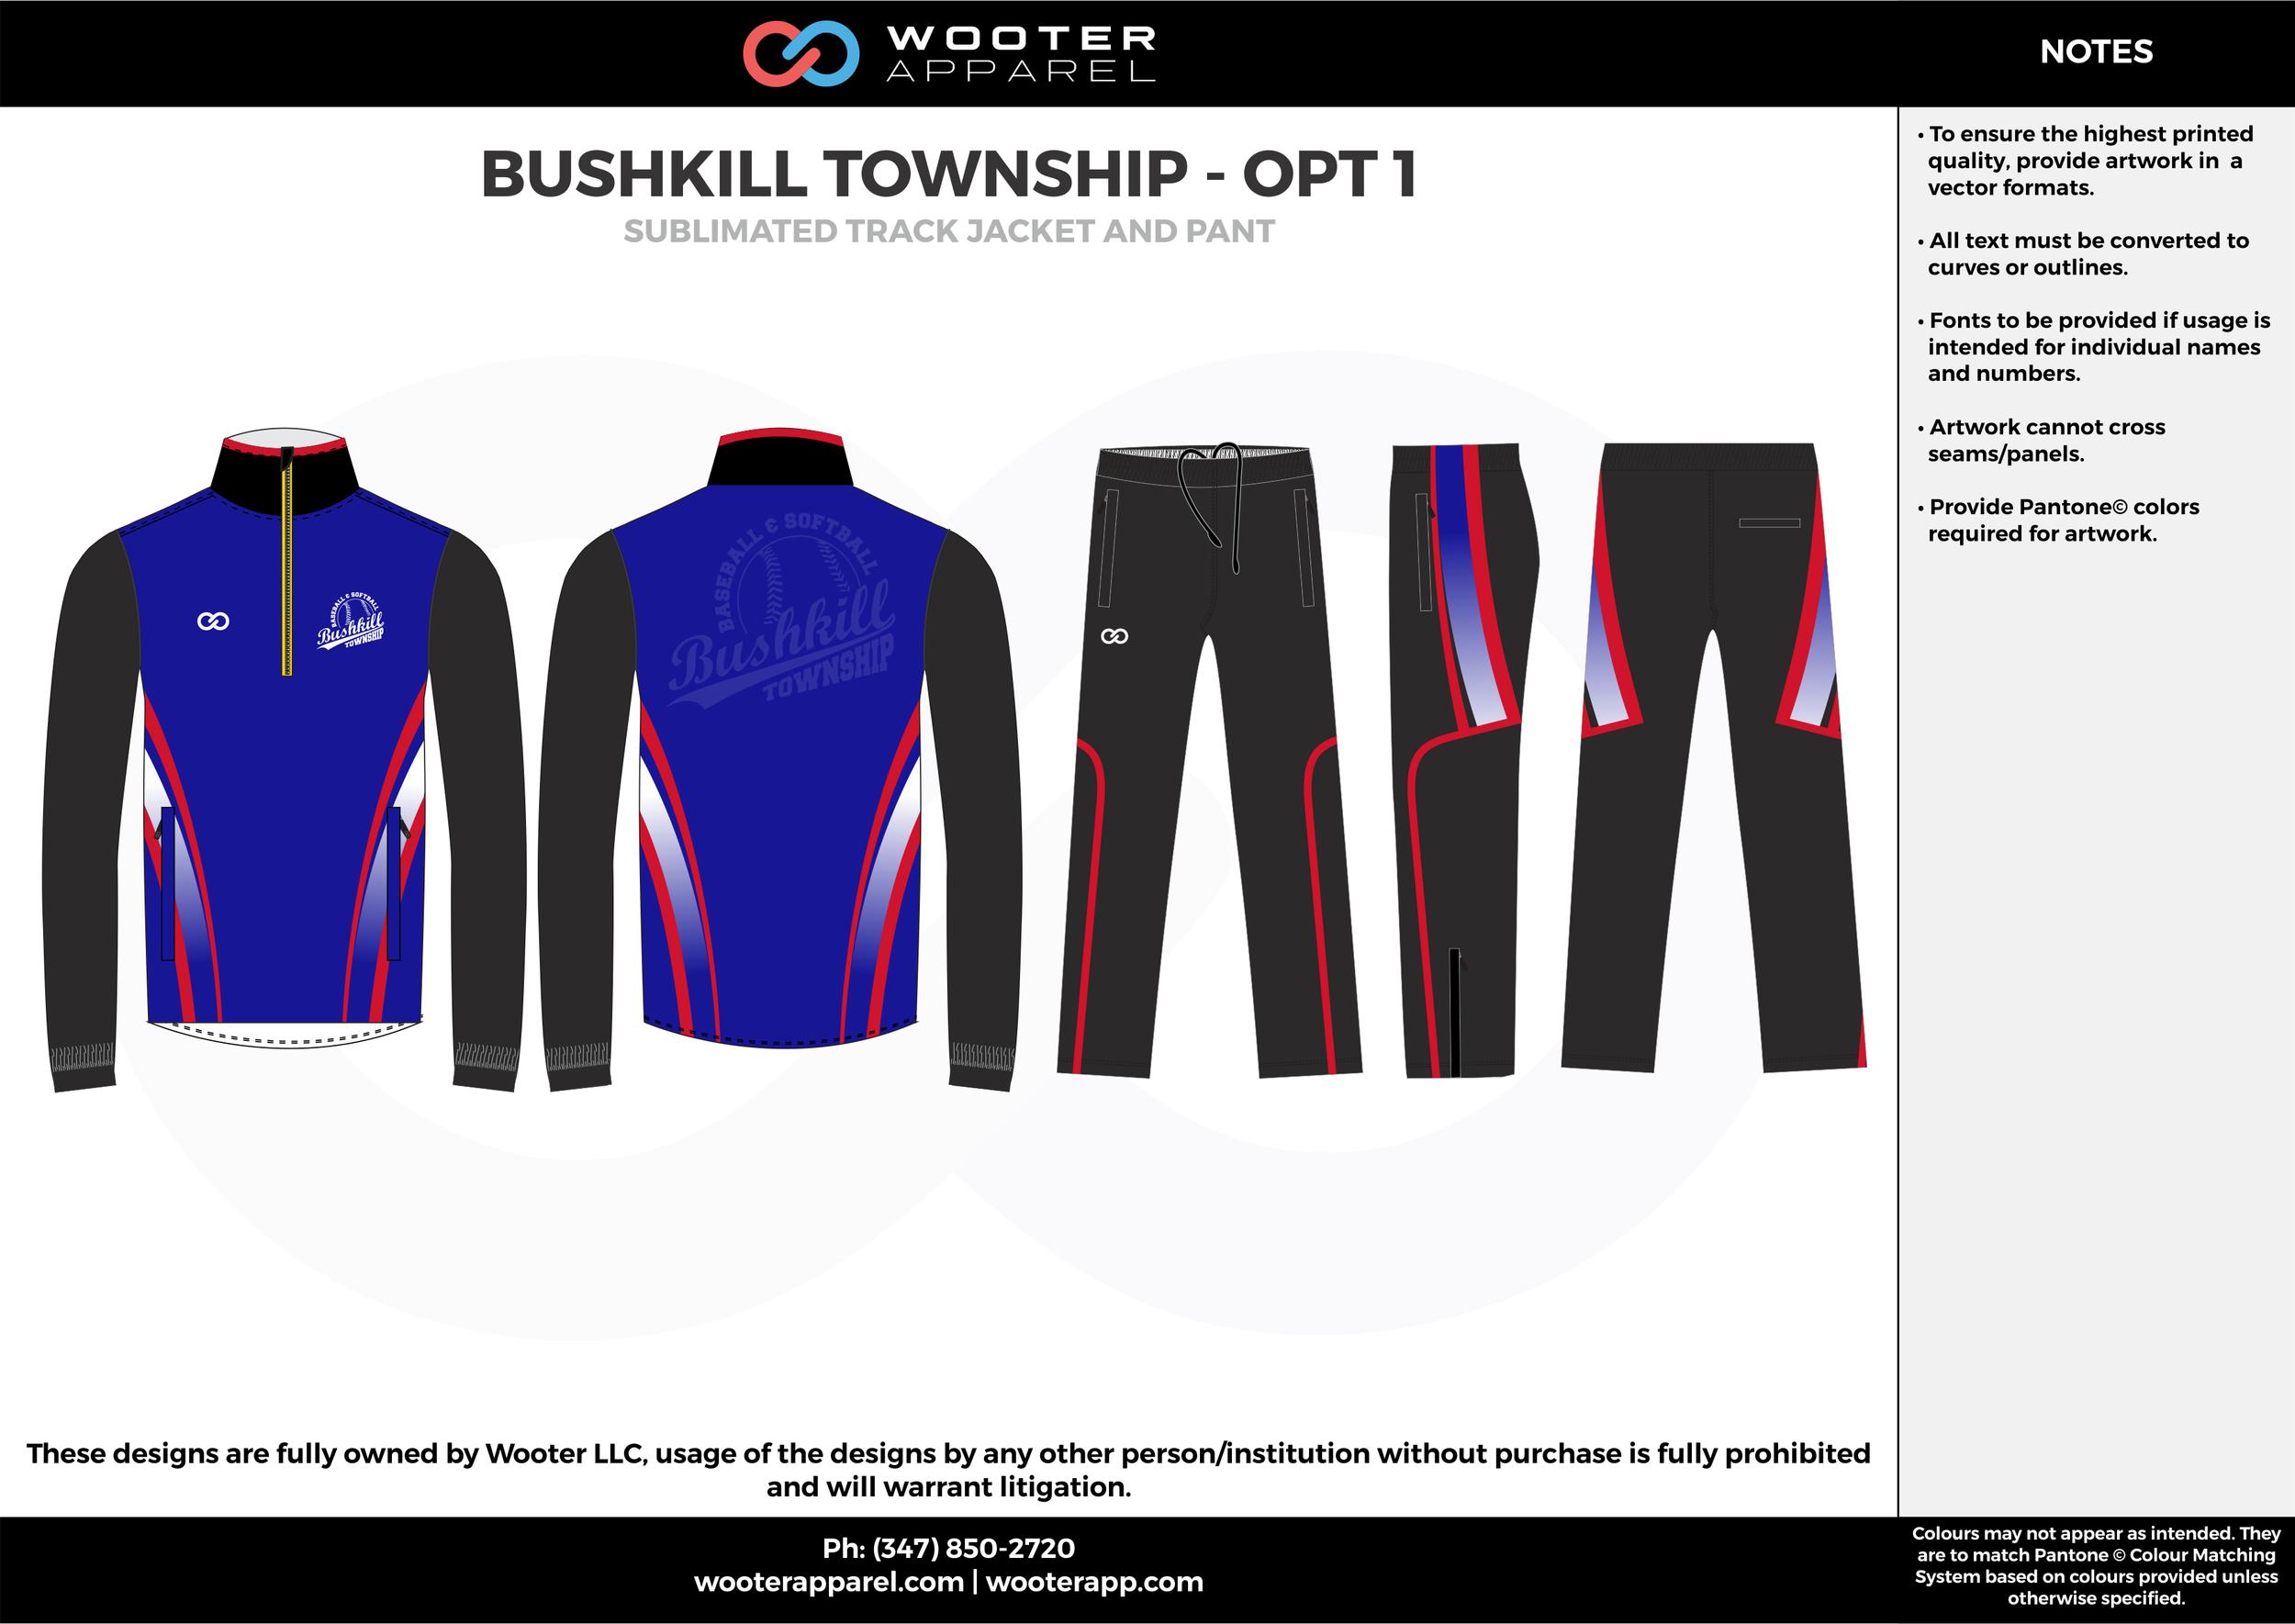 BUSHKILL TOWNSHIP - OPT 1 blue red black Track Jacket, Track Pants, Tracksuit, Warmup Suit